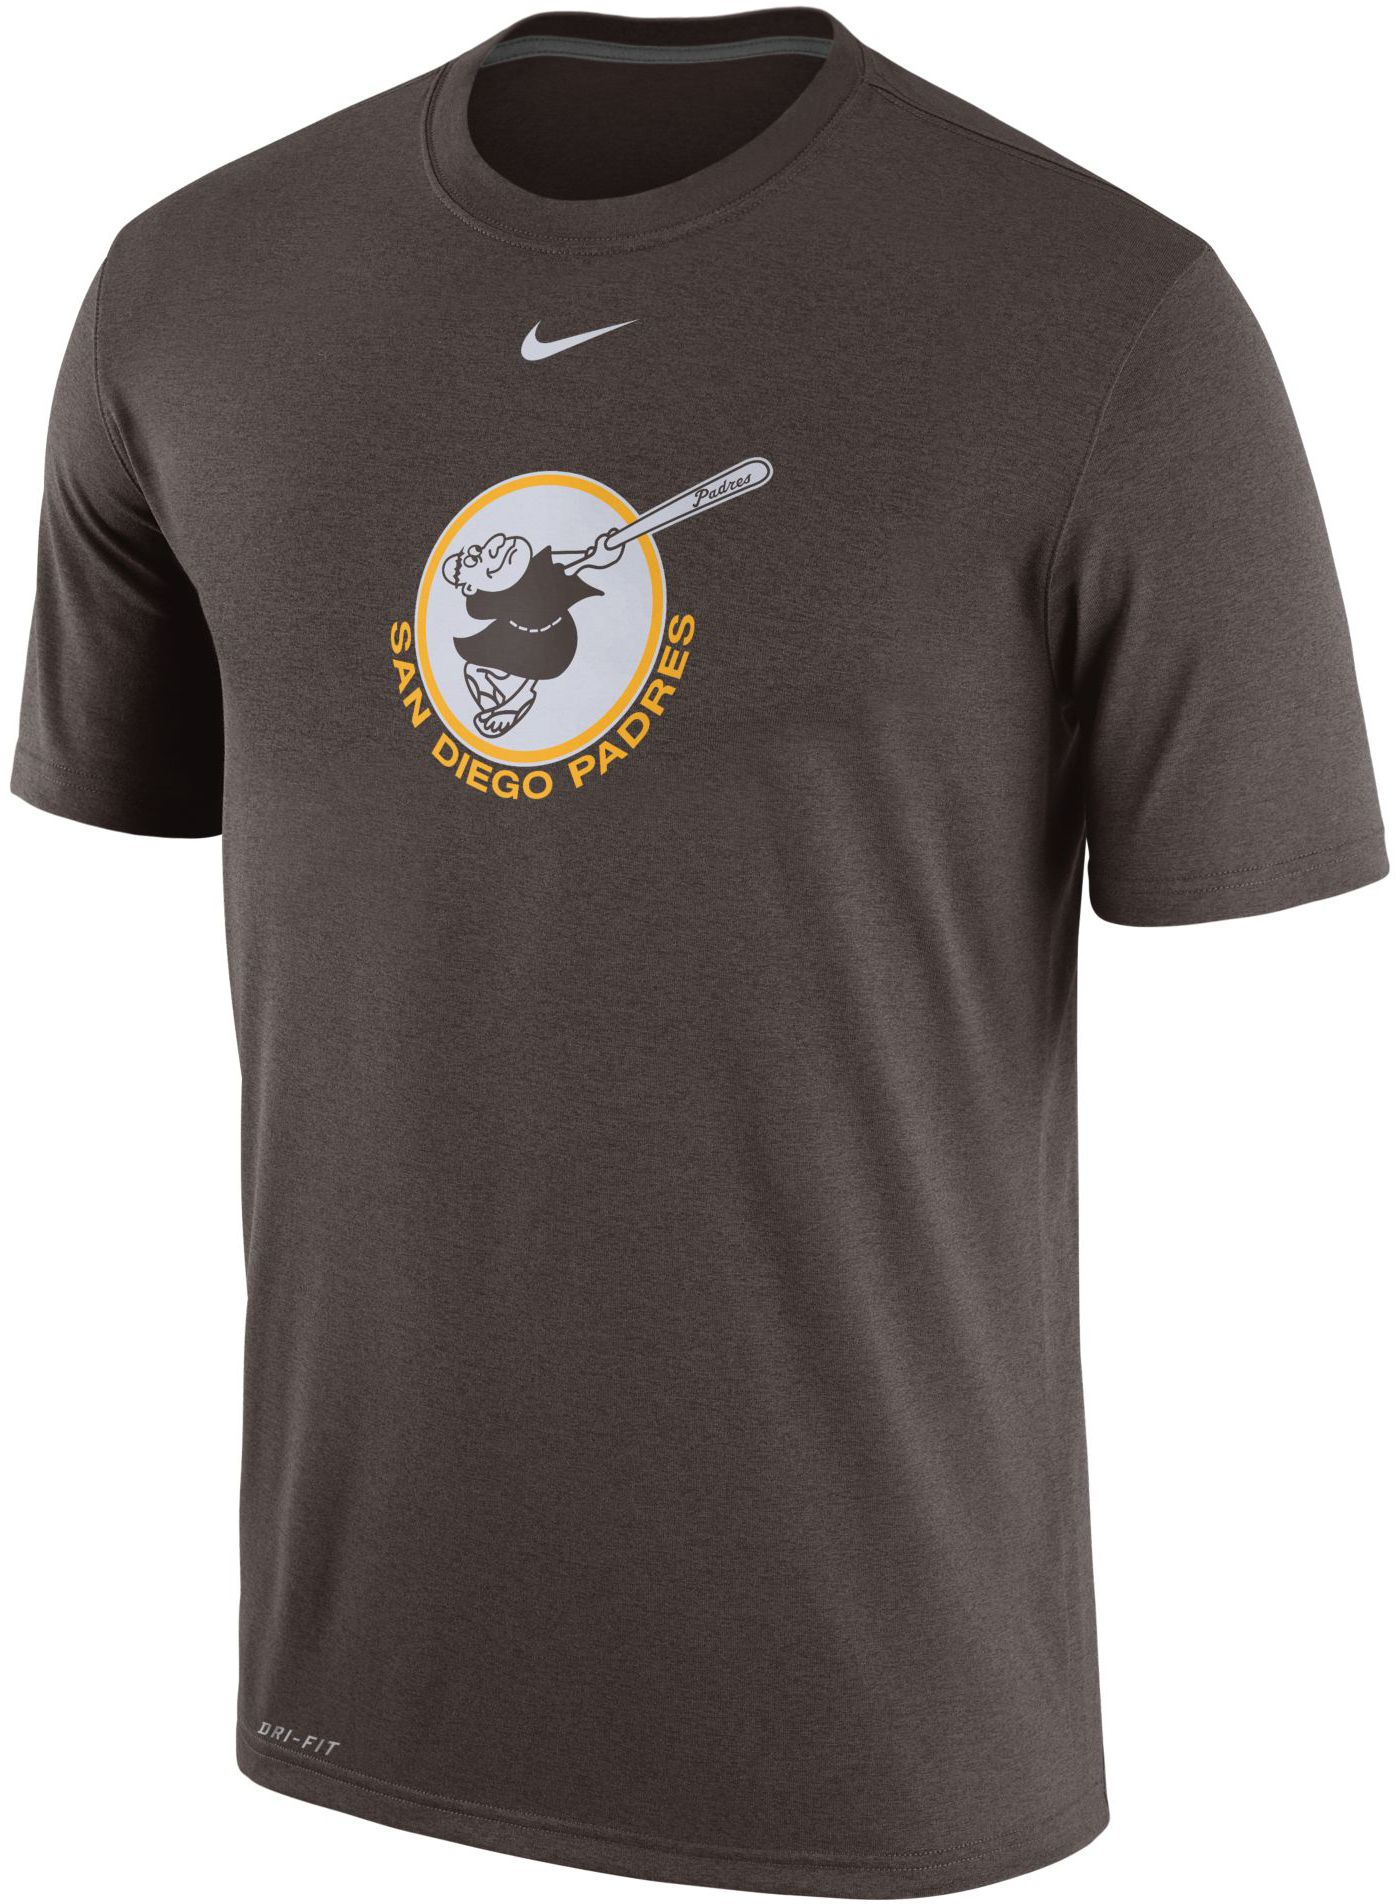 Nike Men's San Diego Padres Dri-FIT Legend T-Shirt